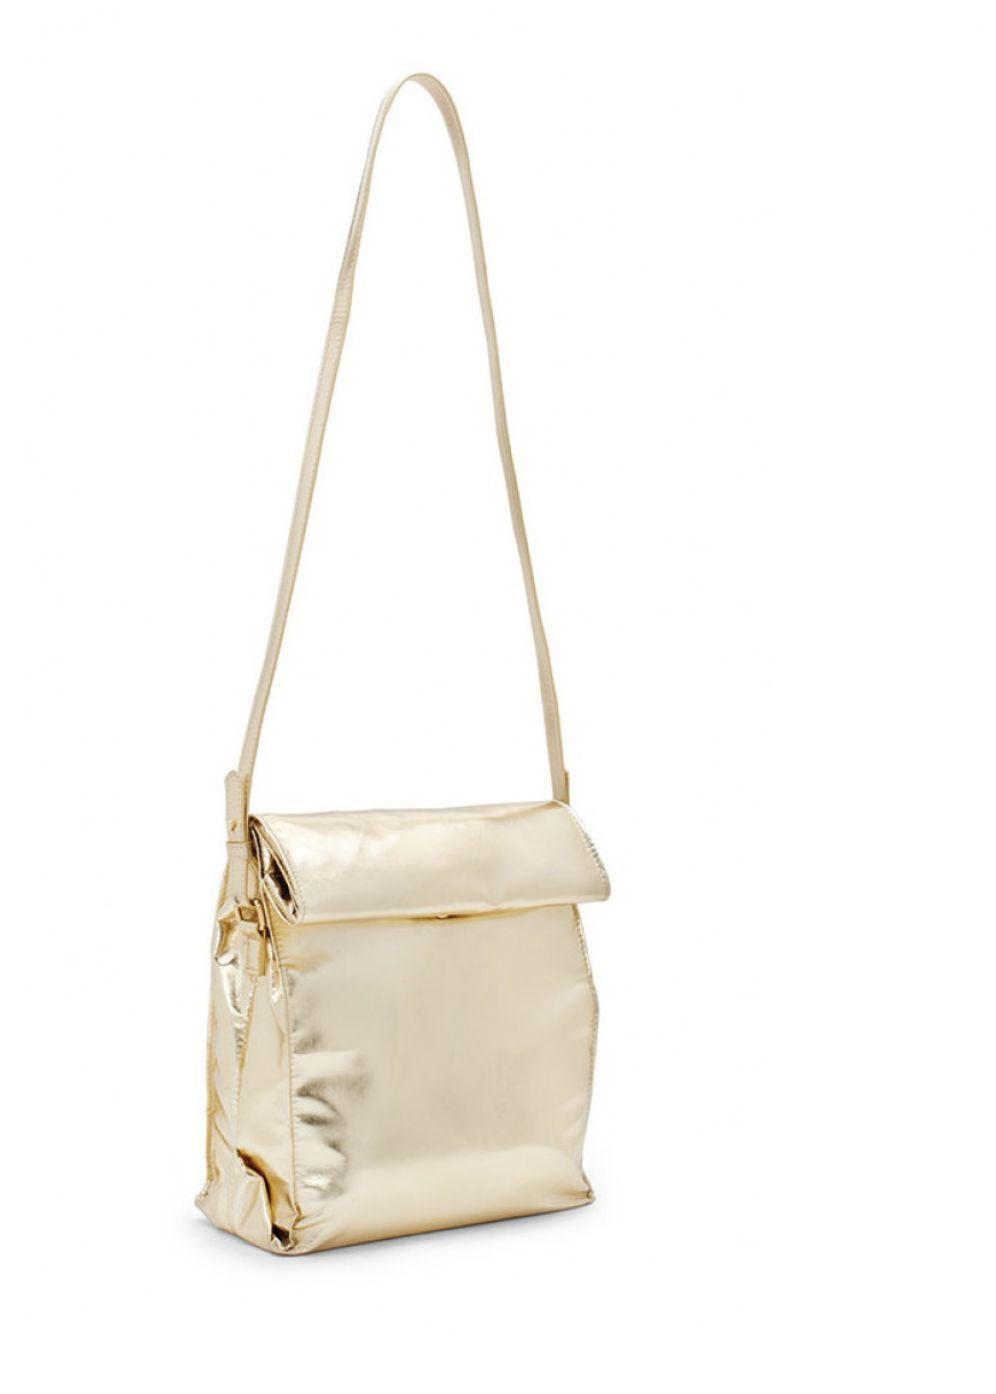 Bando Lunch Crossbody Bag Gold Fashion Pinterest Shanghai Mini Black